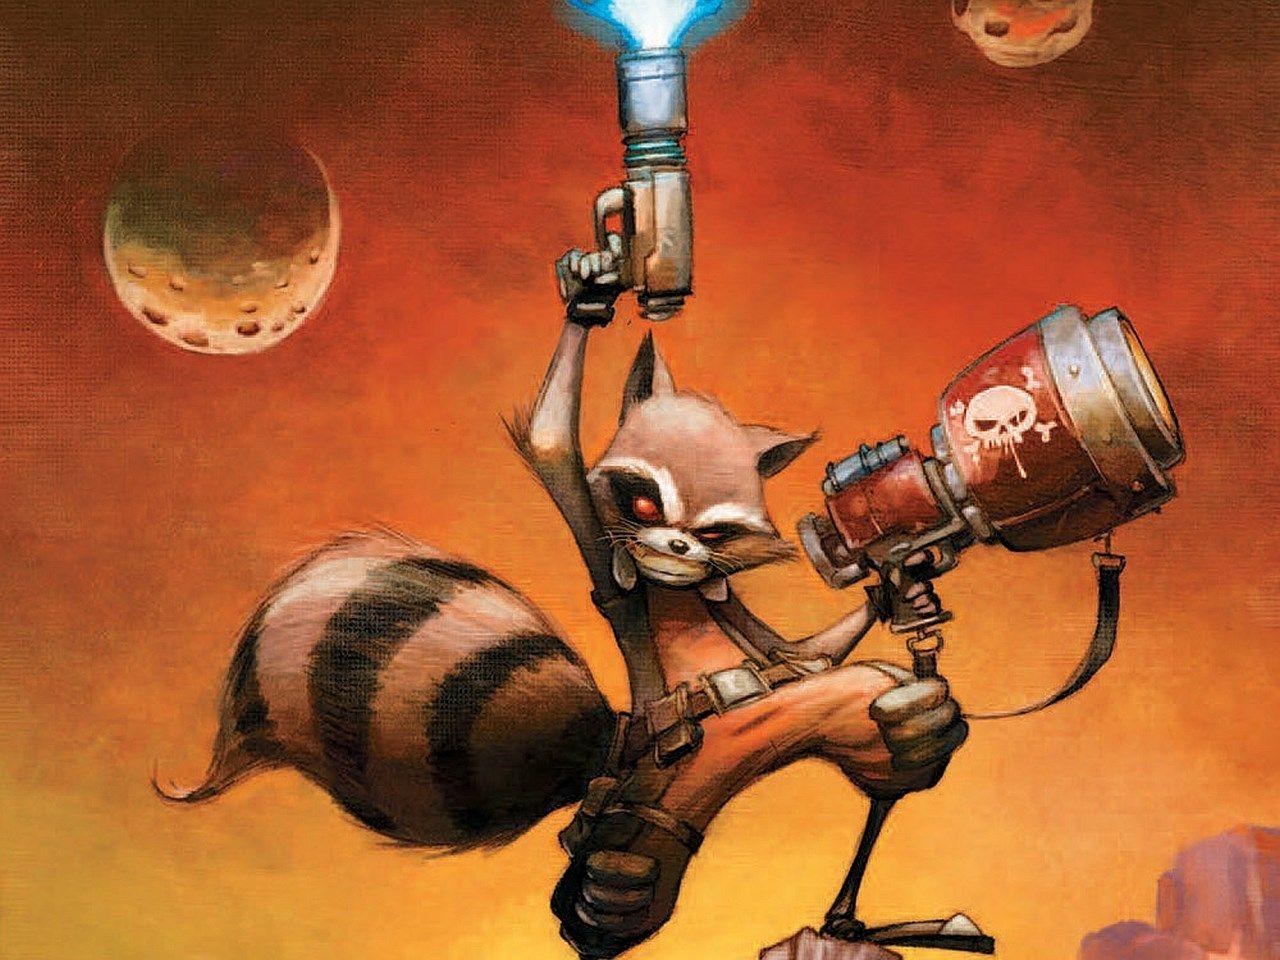 Rocket Raccoon Wallpaper Stratton Gill 1280x960